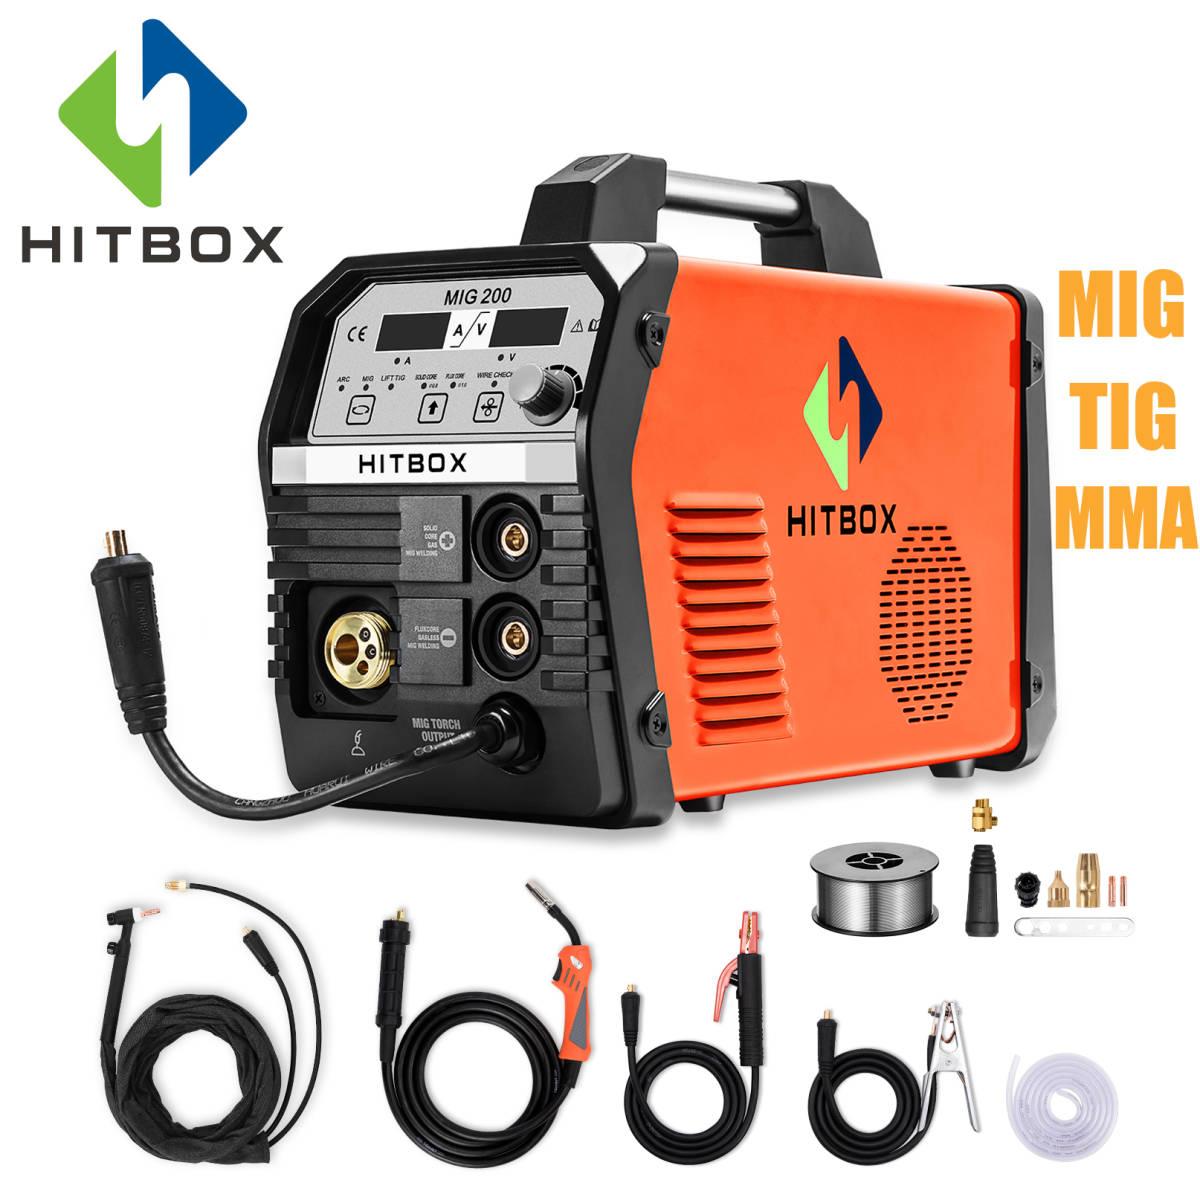 HITBOX Mig 溶接機 MIG200 機能 DC ガス MIG 4.0 ミリメートルアーク溶接機 MIG リフト TIG MMA 220V